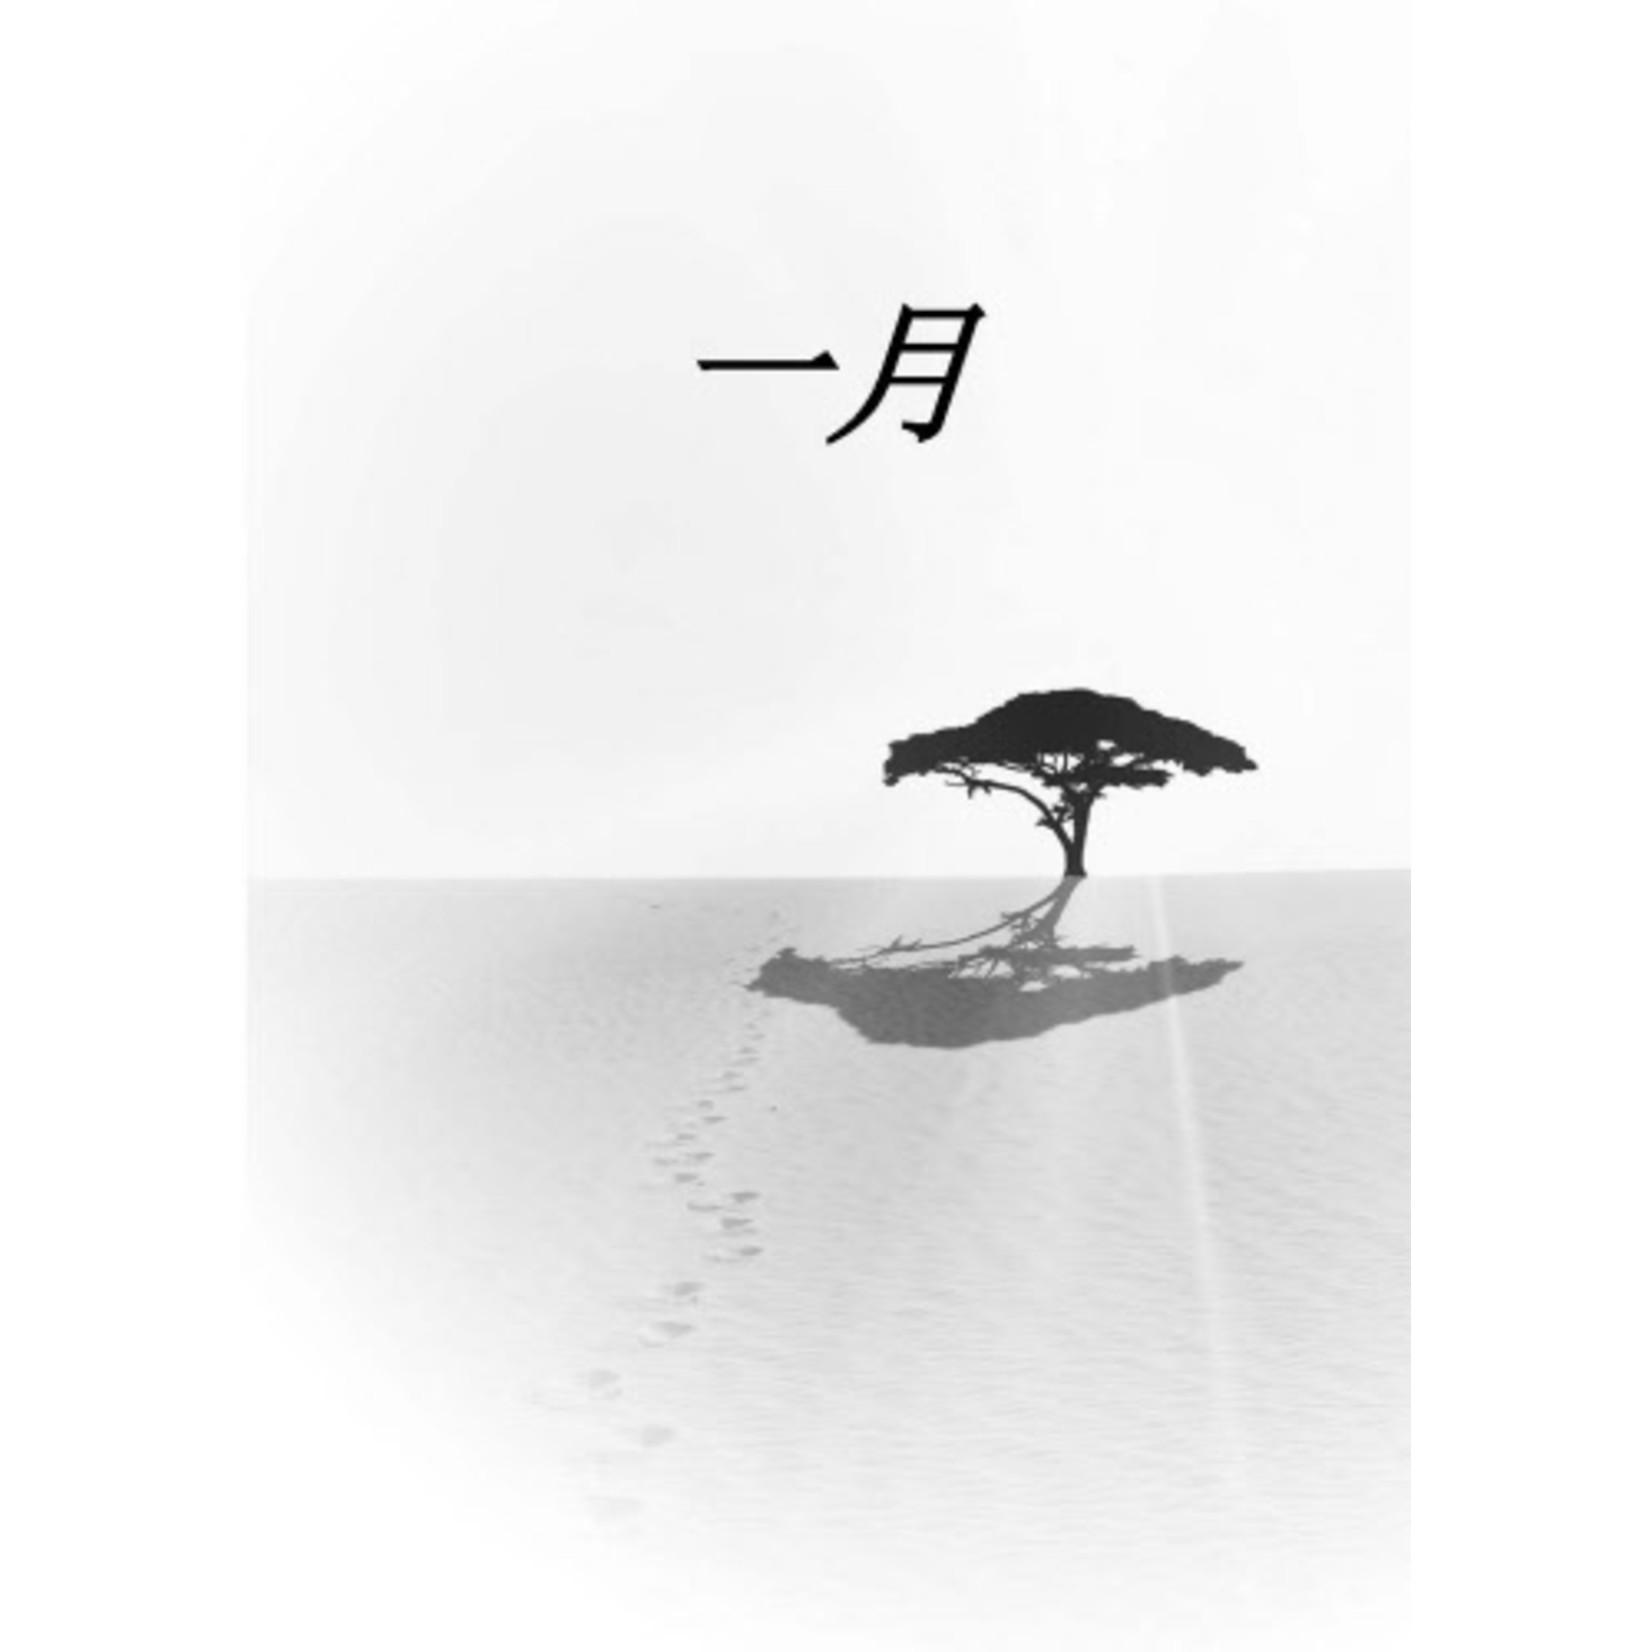 基督使者協會 Ambassadors for Christ 荒漠甘泉(簡體版) Streams in the Desert